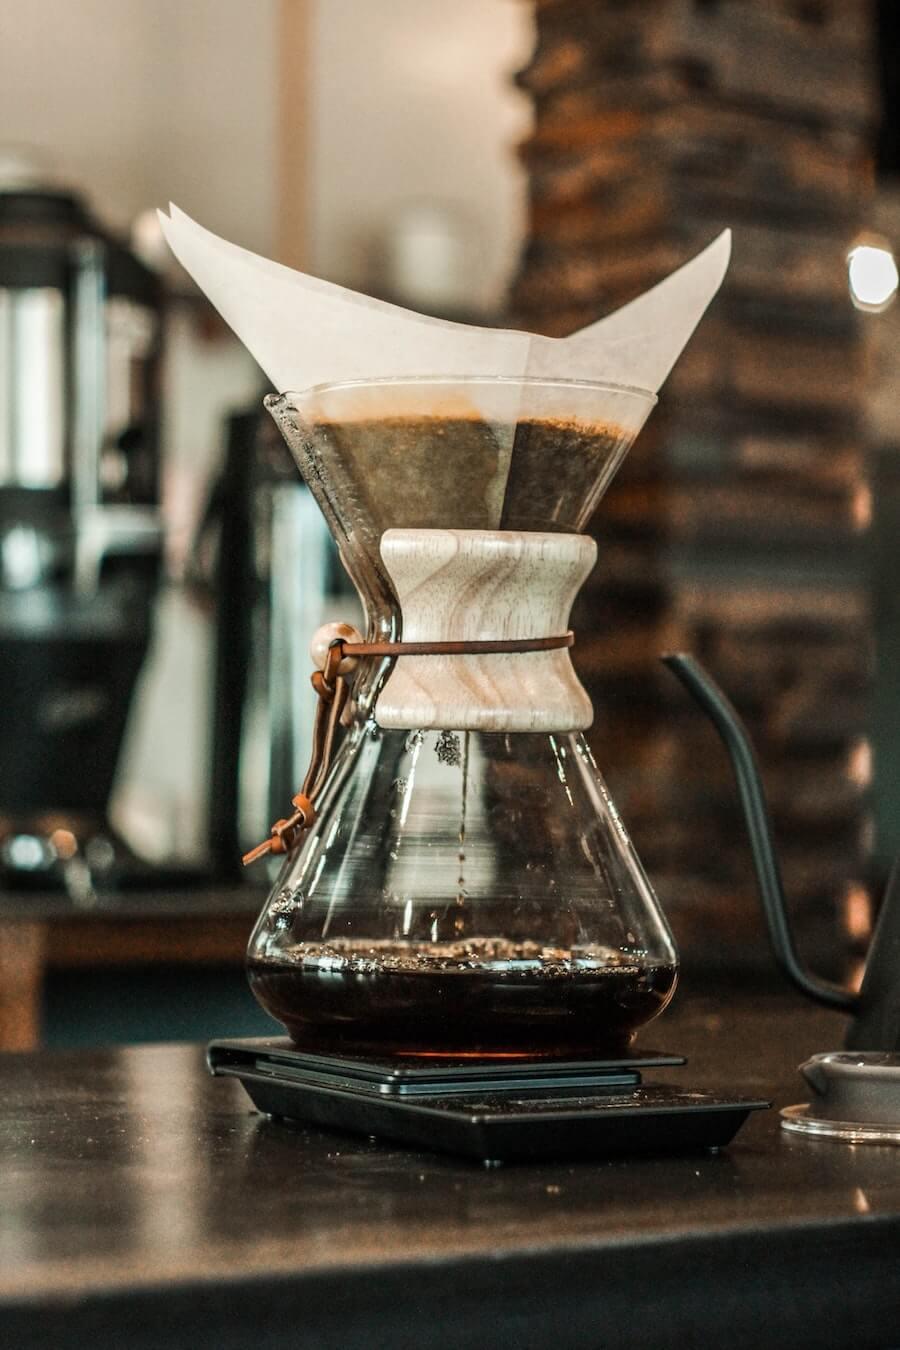 Chemex Kaffeekaraffe mit frischem Kaffee